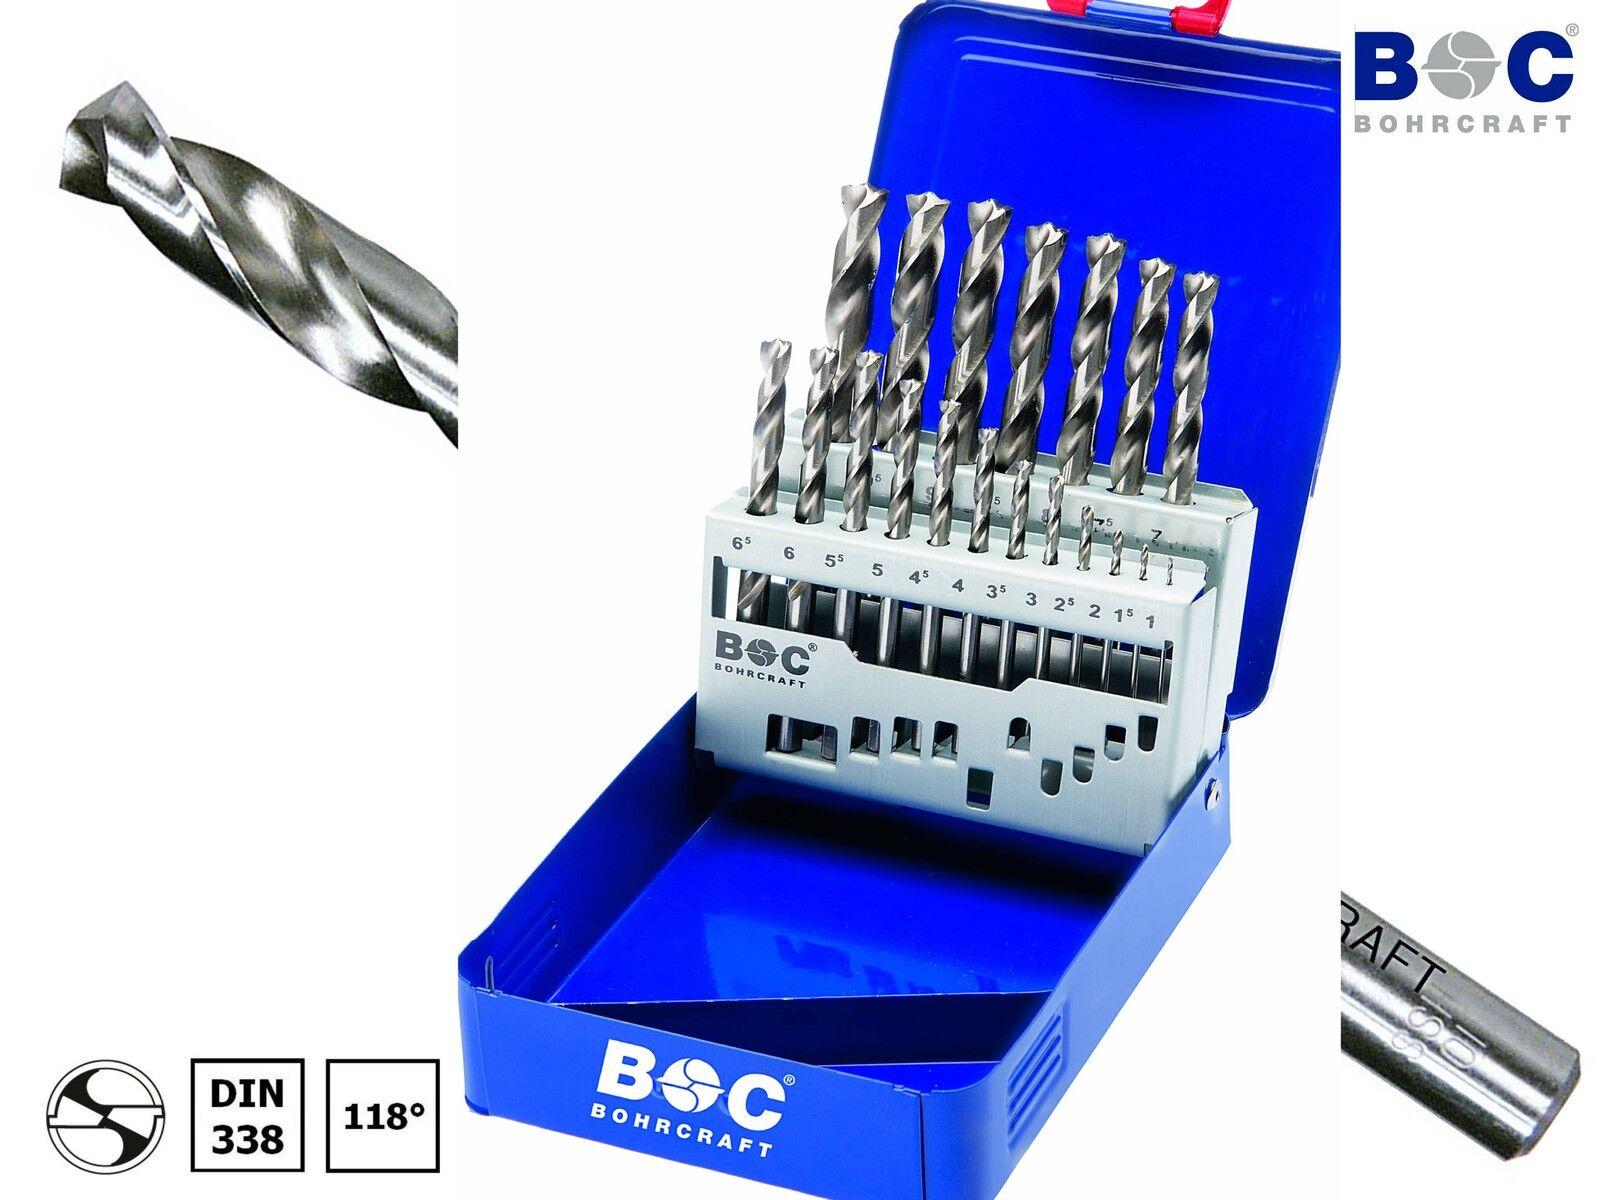 BOHRCRAFT 25-tlg HSS-GX DIN338 Metall Spiralbohrer 1,0-13,0 x 0,5mm Bohrer